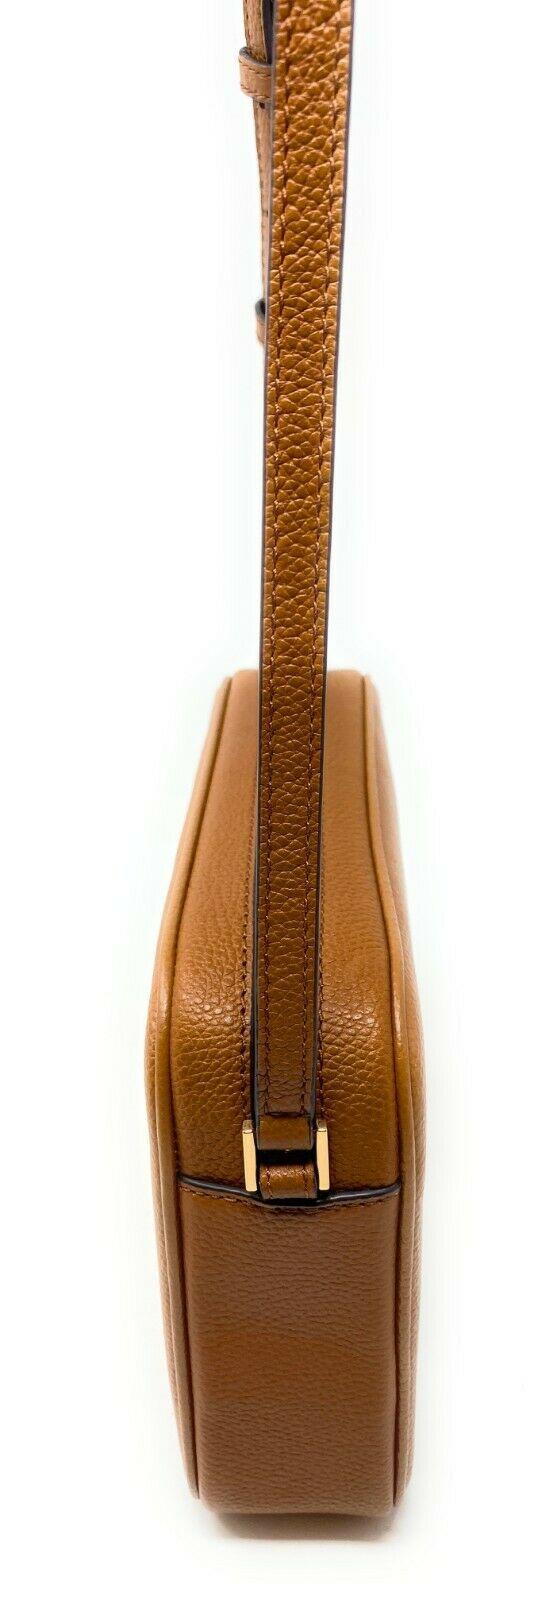 thumbnail 34 - Michael Kors Jet Set Item Large East West Crossbody Chain Handbag Clutch $298